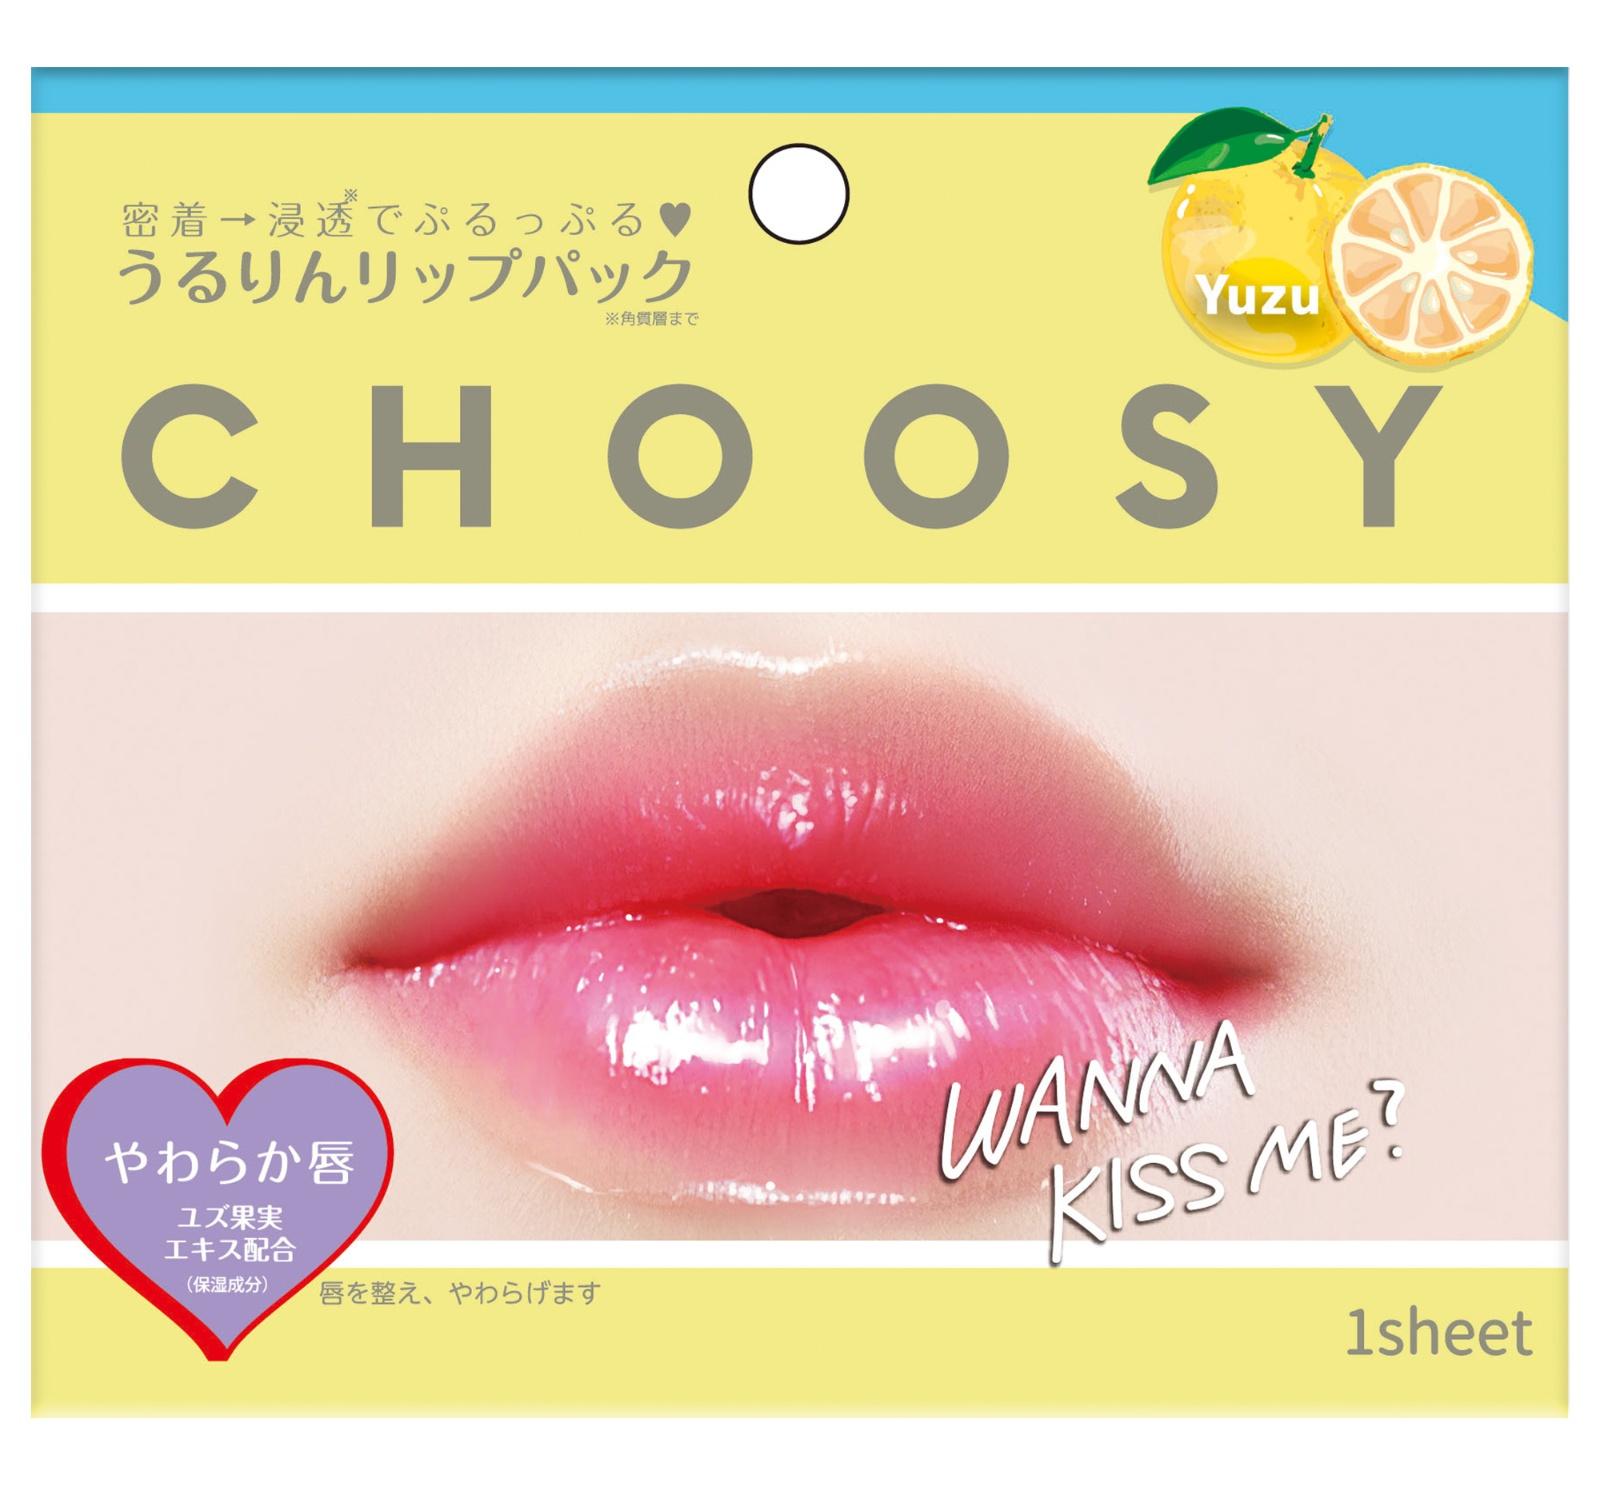 Choosy Lip Pack - Yuzu